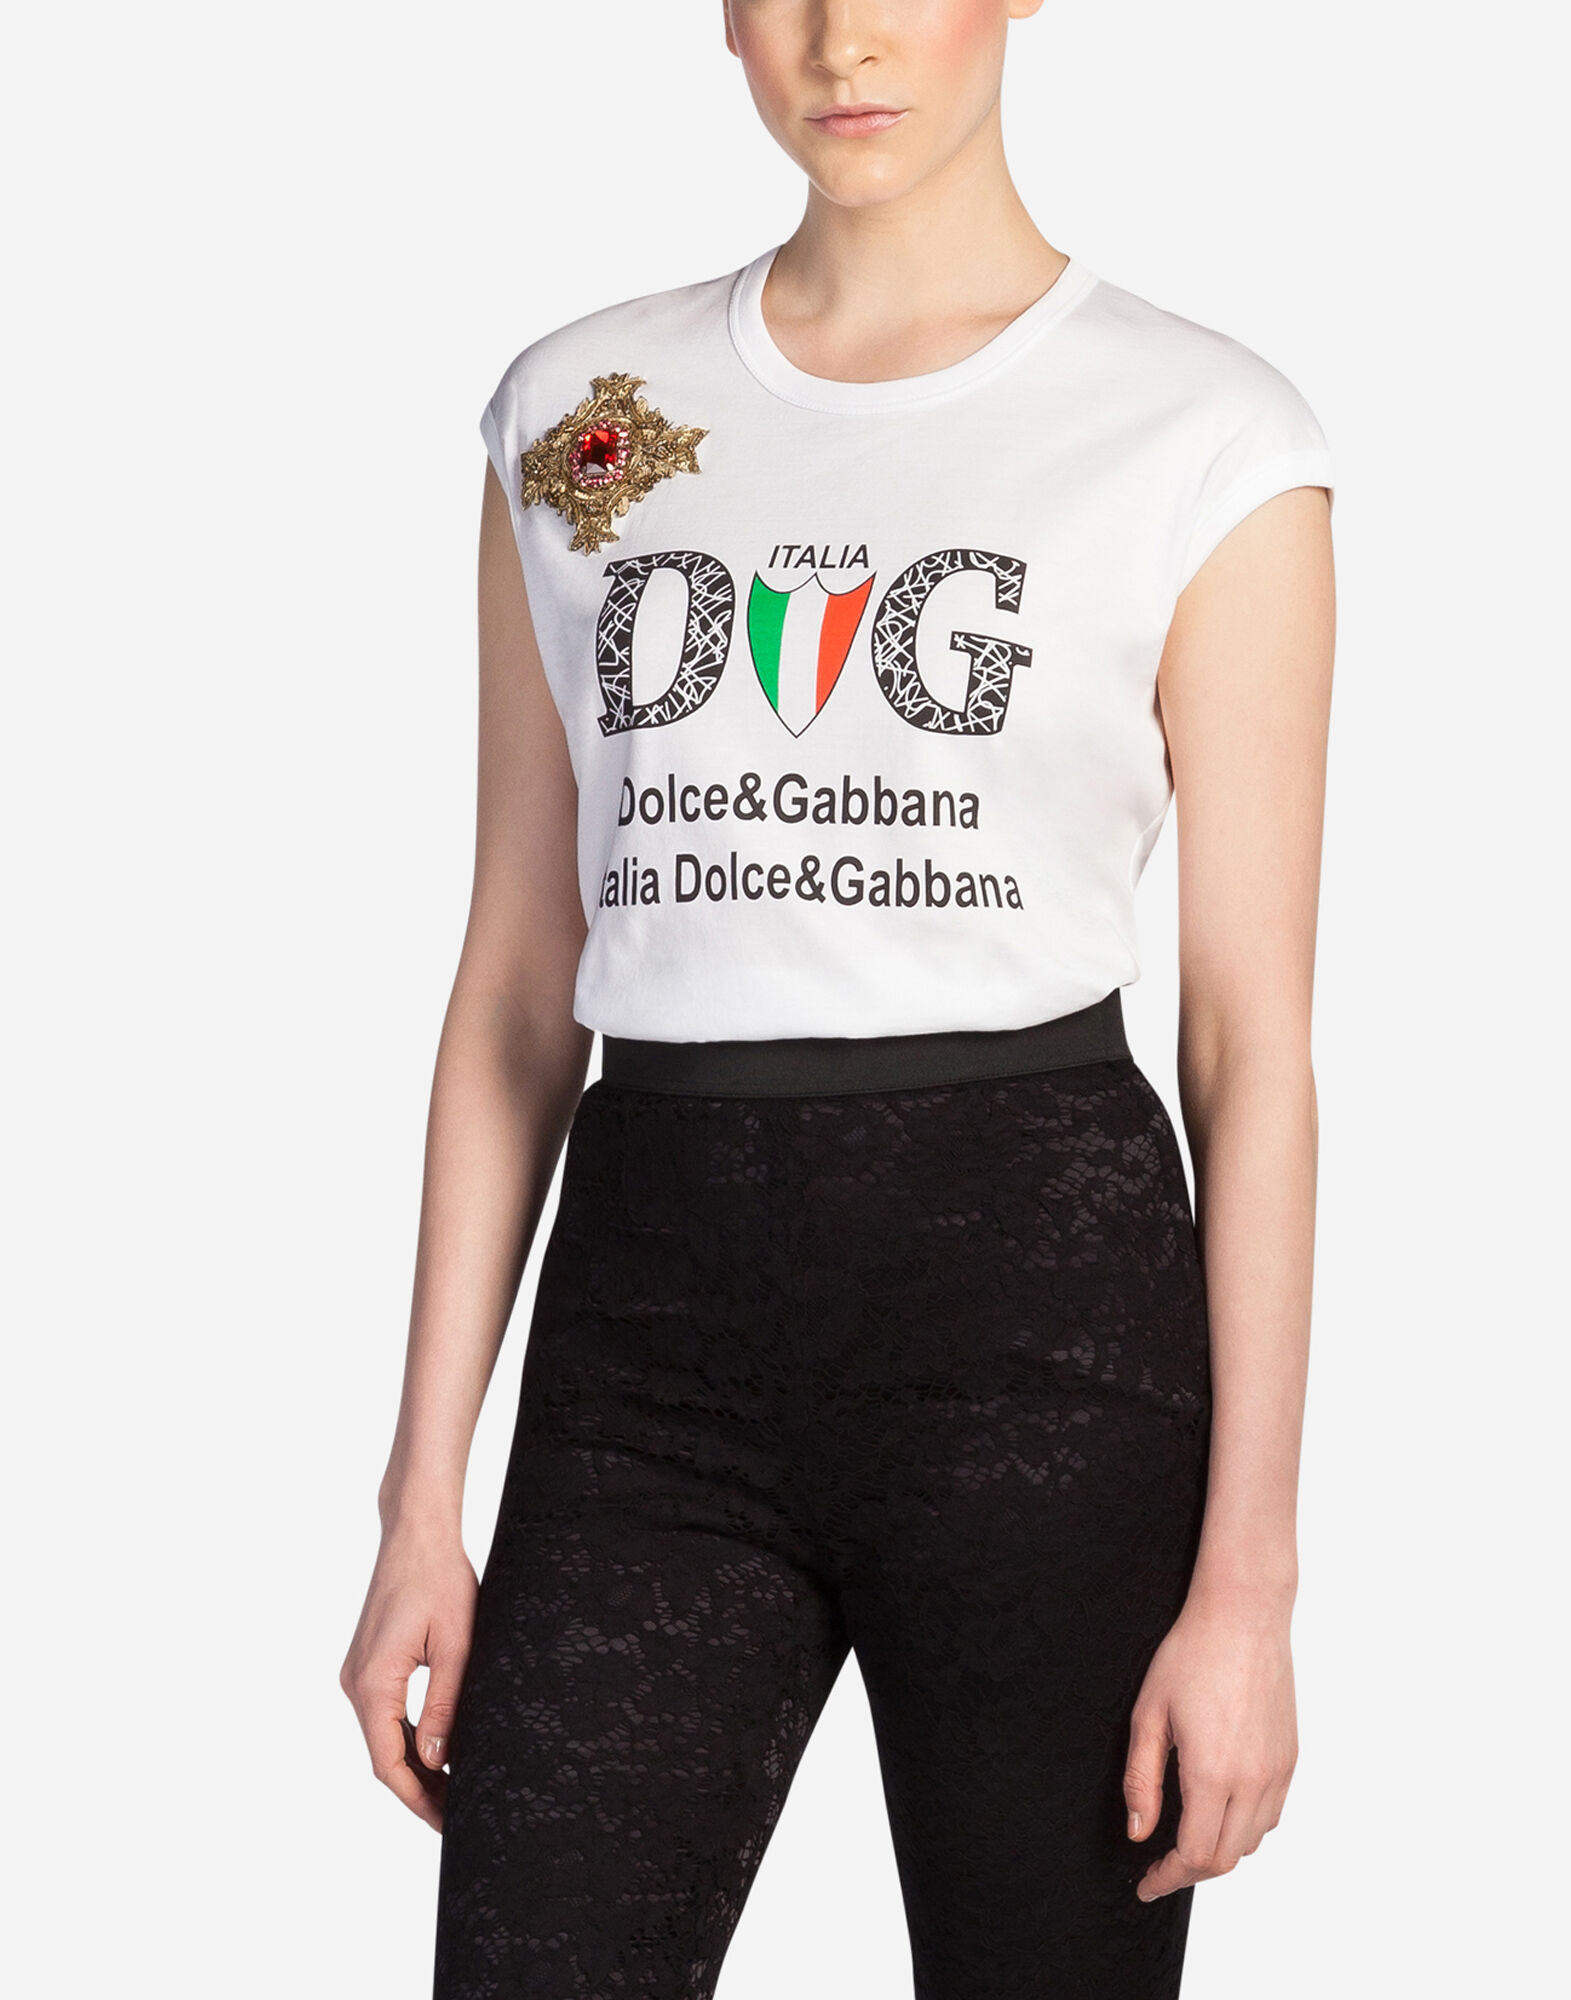 women 39 s t shirts and sweatshirts dolce gabbana t shirt. Black Bedroom Furniture Sets. Home Design Ideas